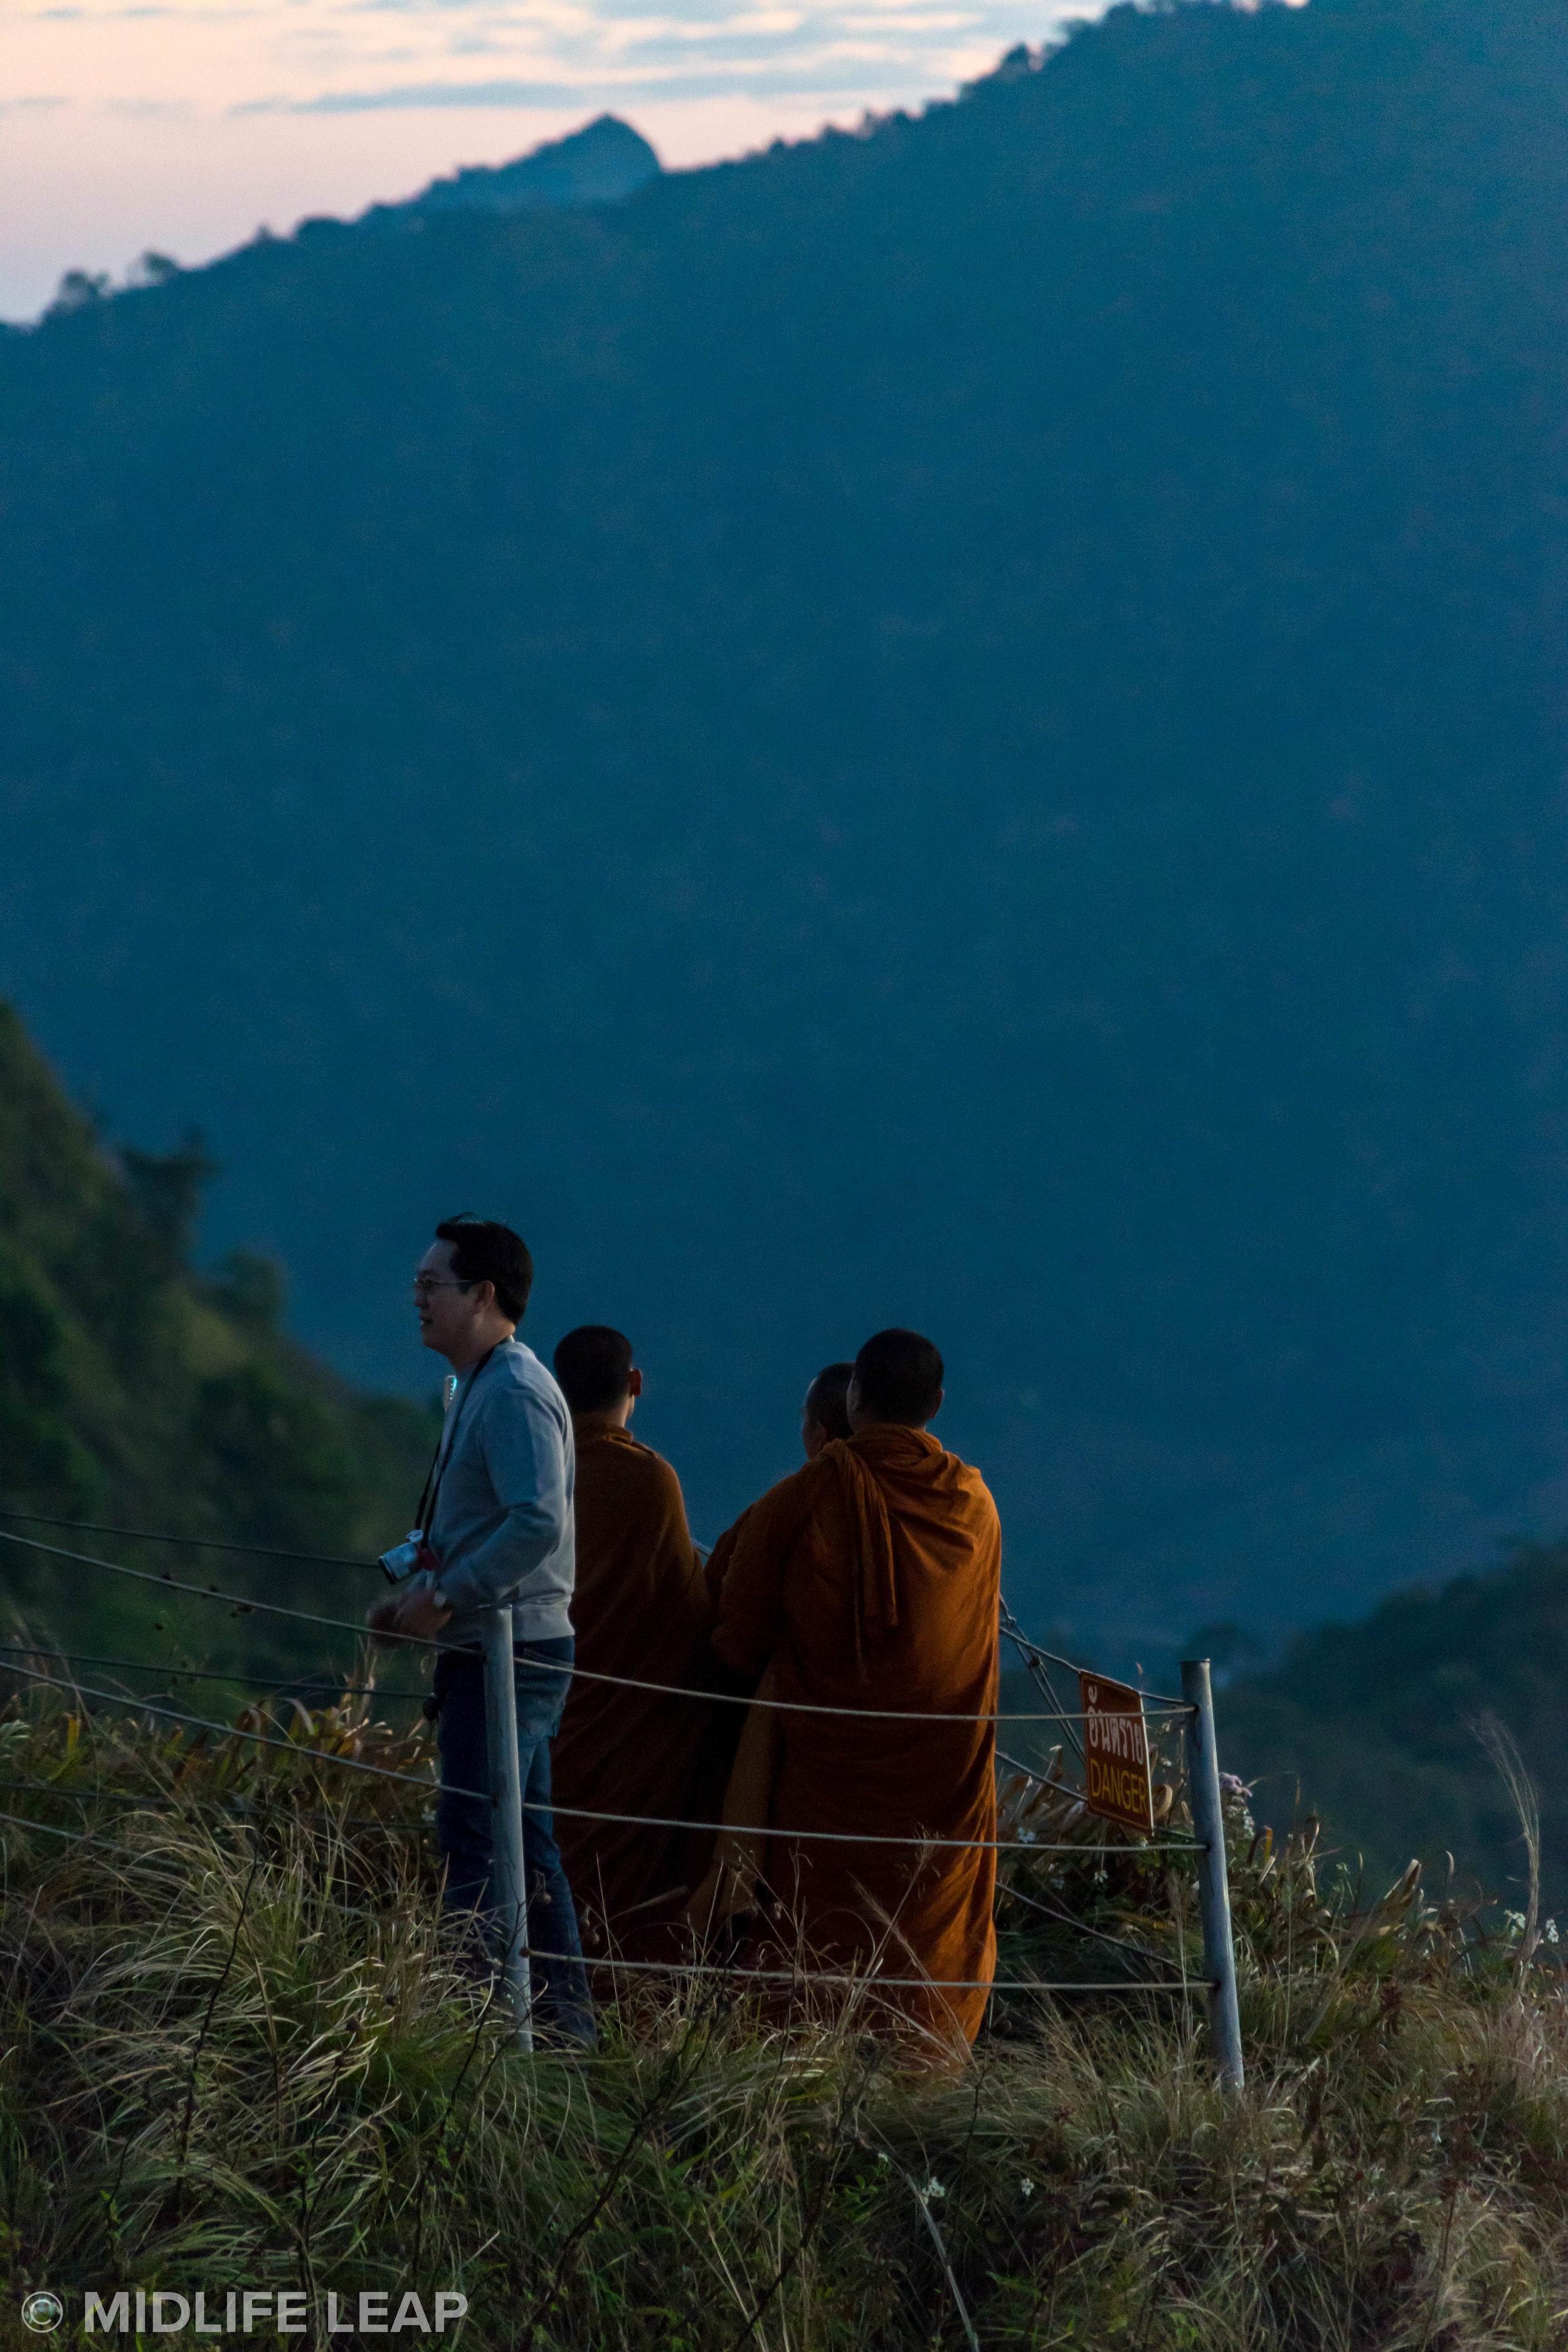 Even Buddhist Monks take selfies